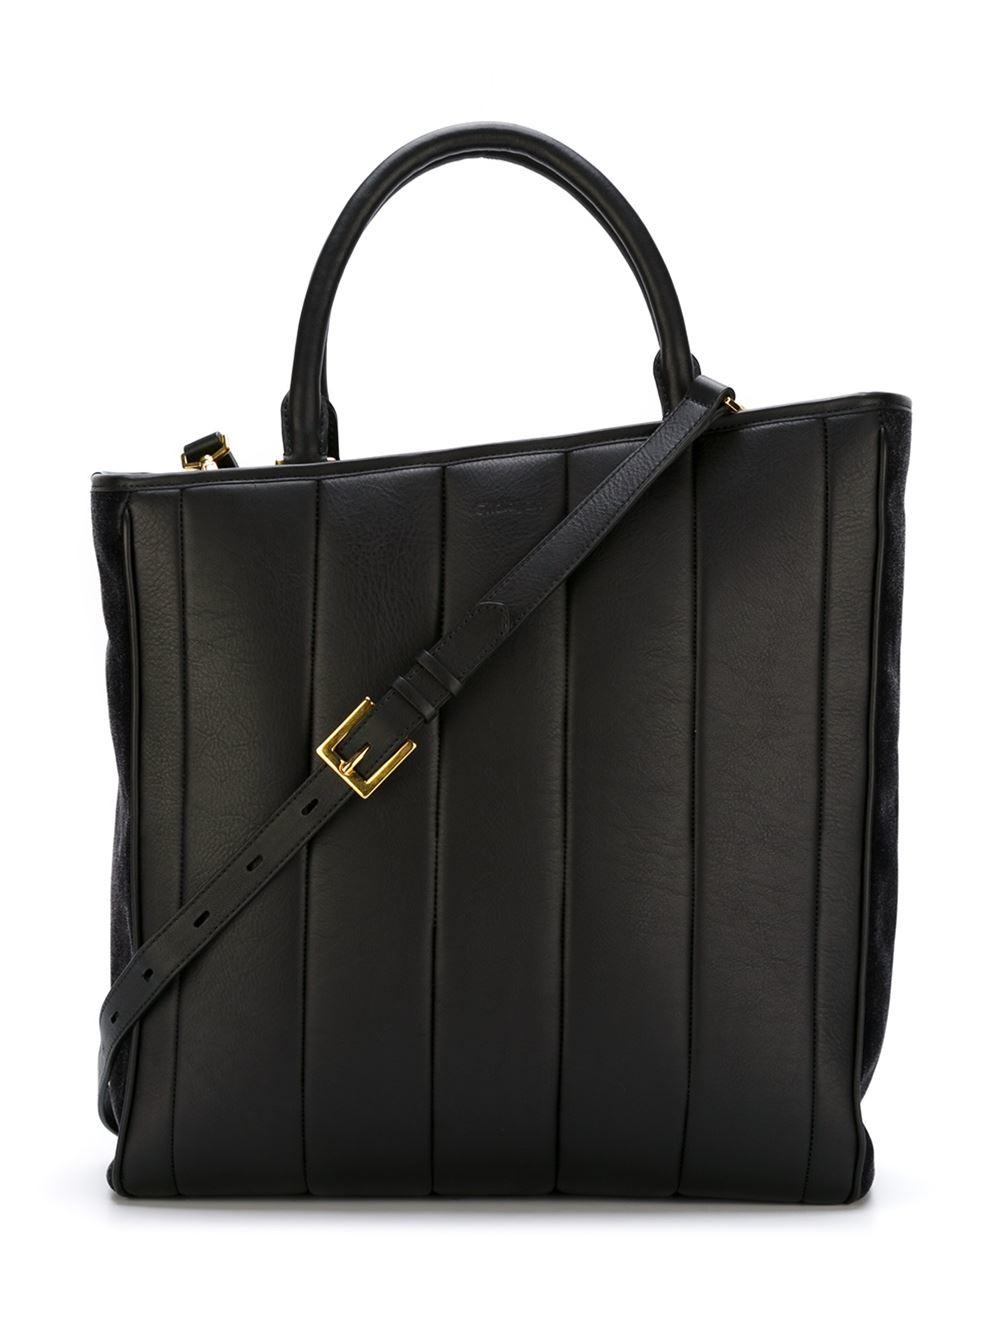 Chalayan Leather 'inertia' Tote in Black